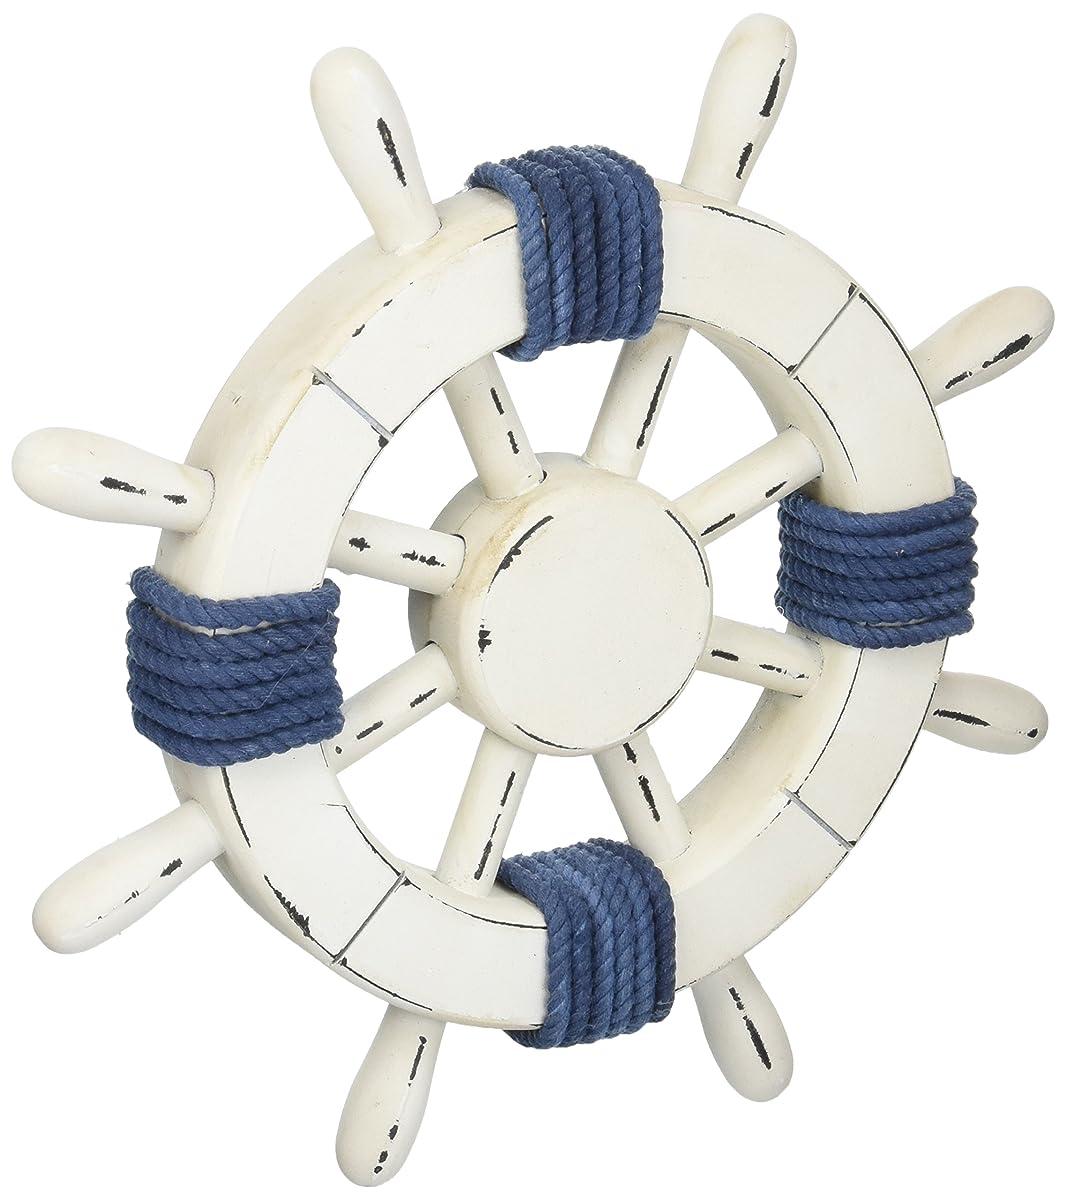 "Hampton Nautical 12"" Wooden Steering Rustic White Decorative Ship Wheel with Dark Blue Rope"